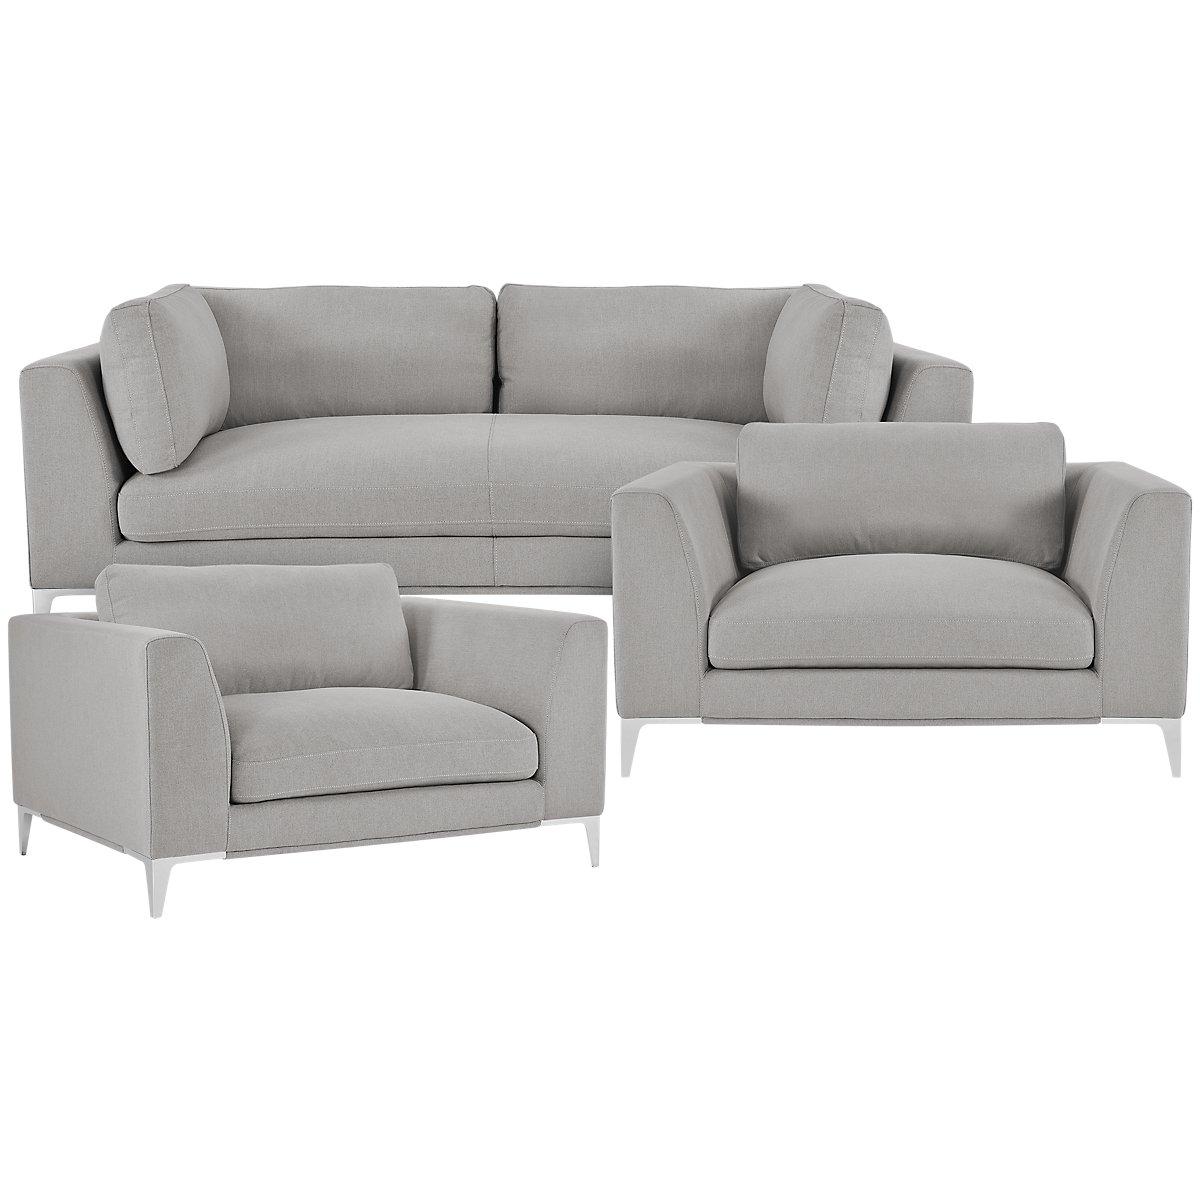 City Furniture: Madison Gray Fabric Living Room